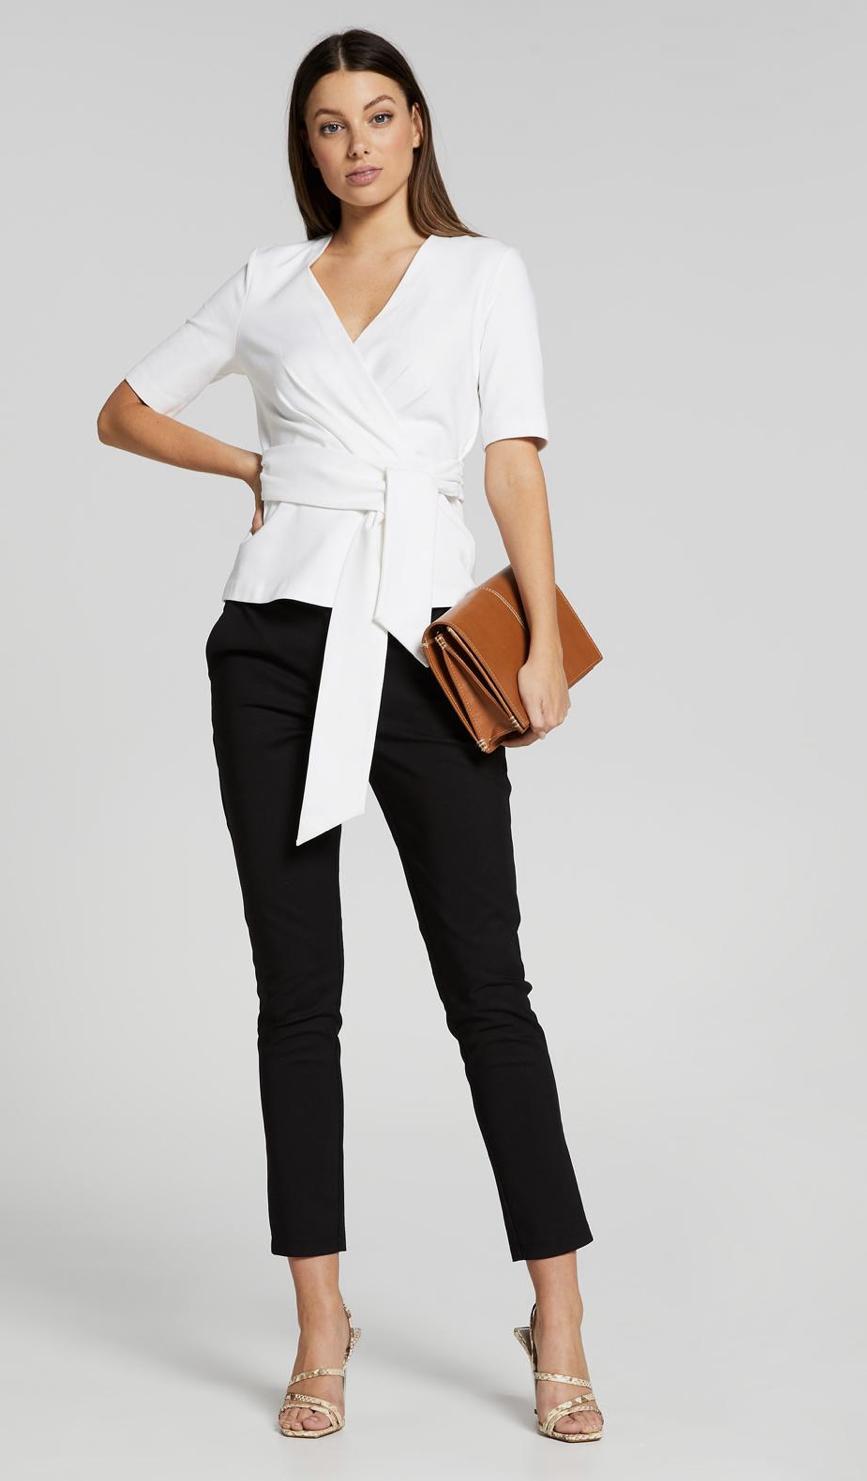 Portmans Elbow Sleeve A Game Ponte Top & The Wheeler Dealer Suit Pant